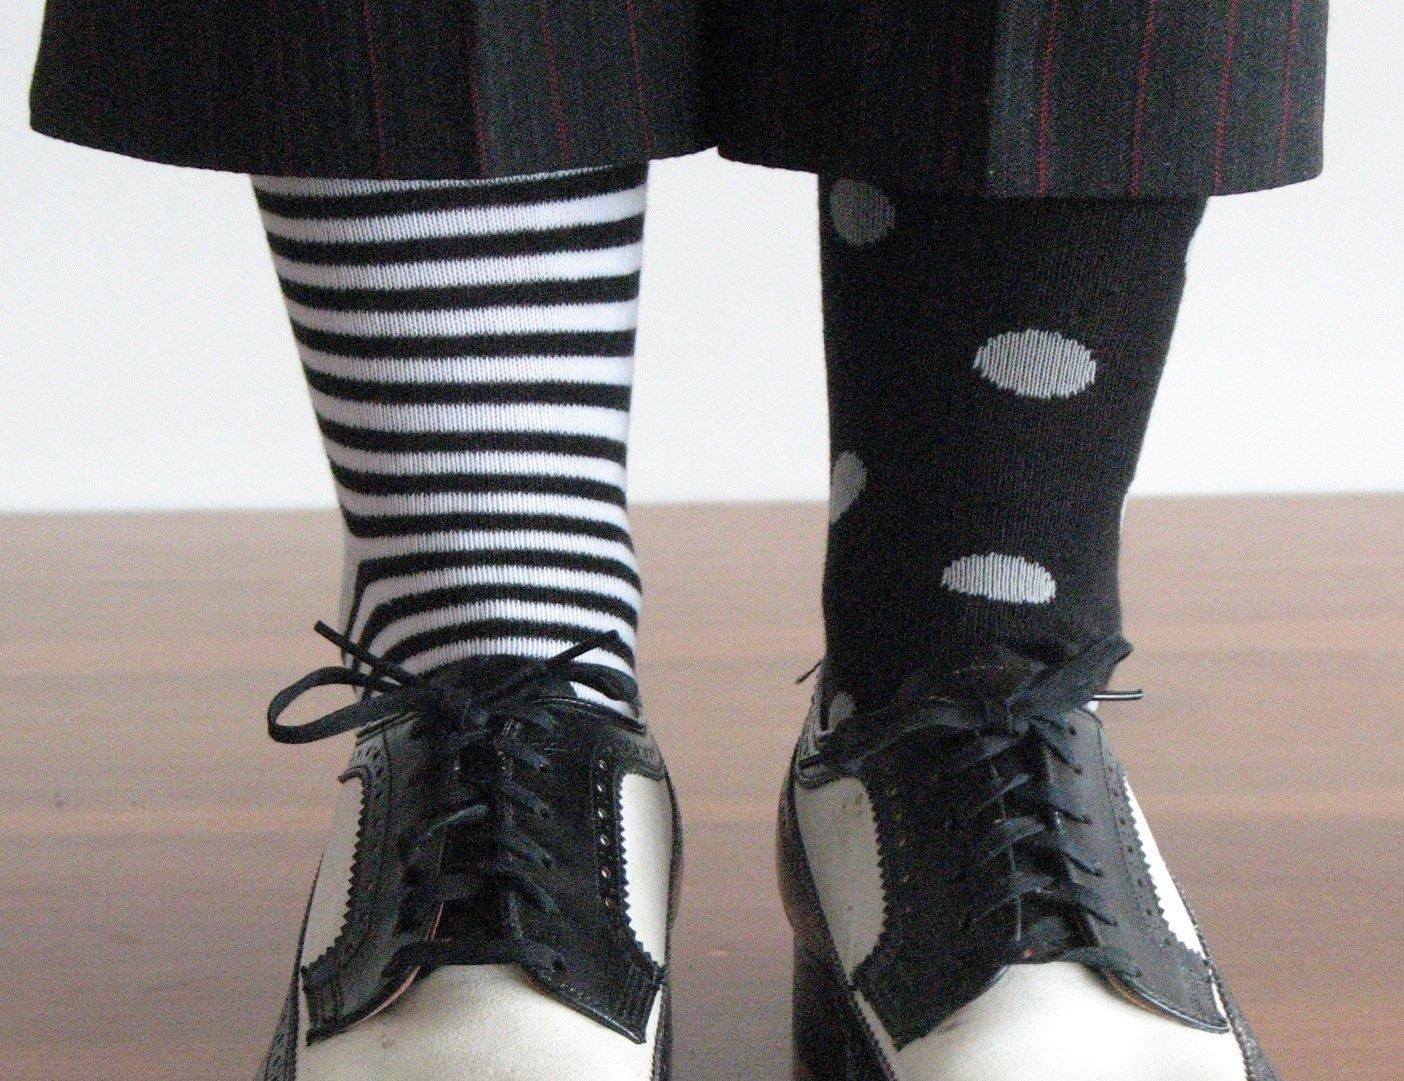 Asymmetriphobia – funny phobia